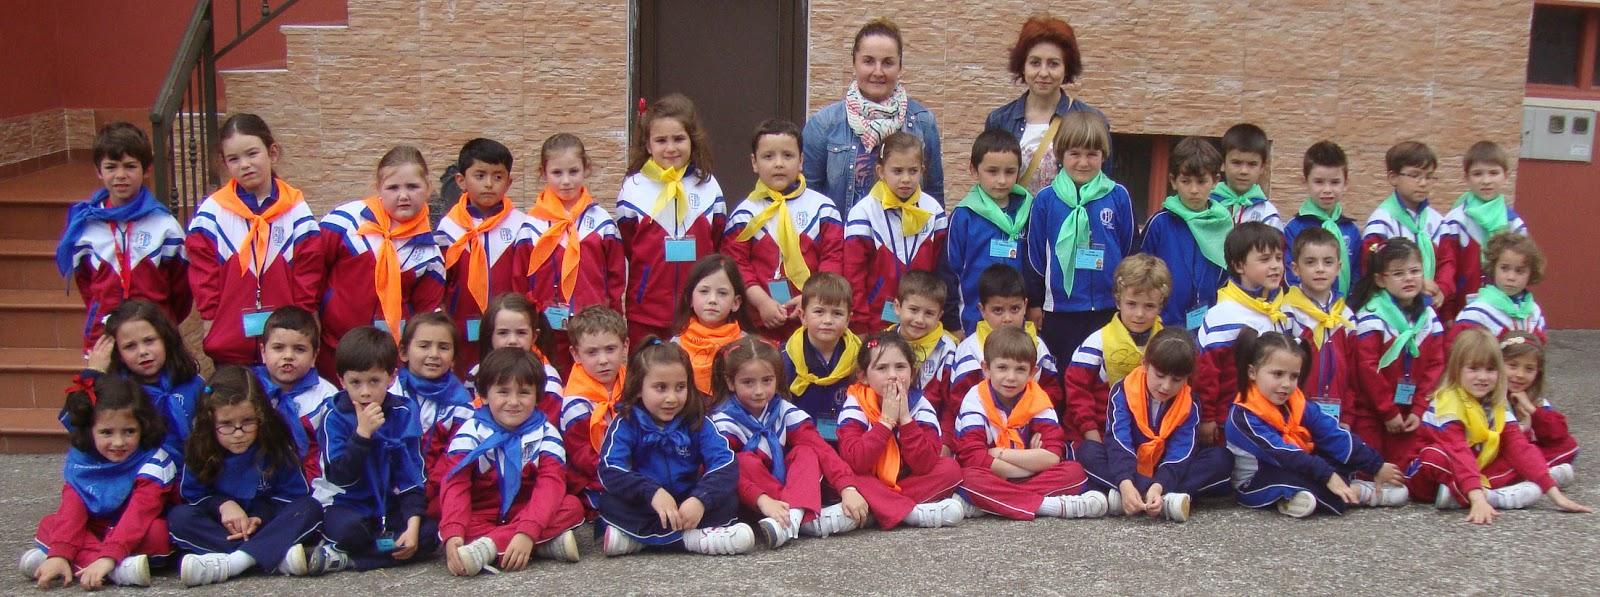 escuela de educacion infantil de colunga: